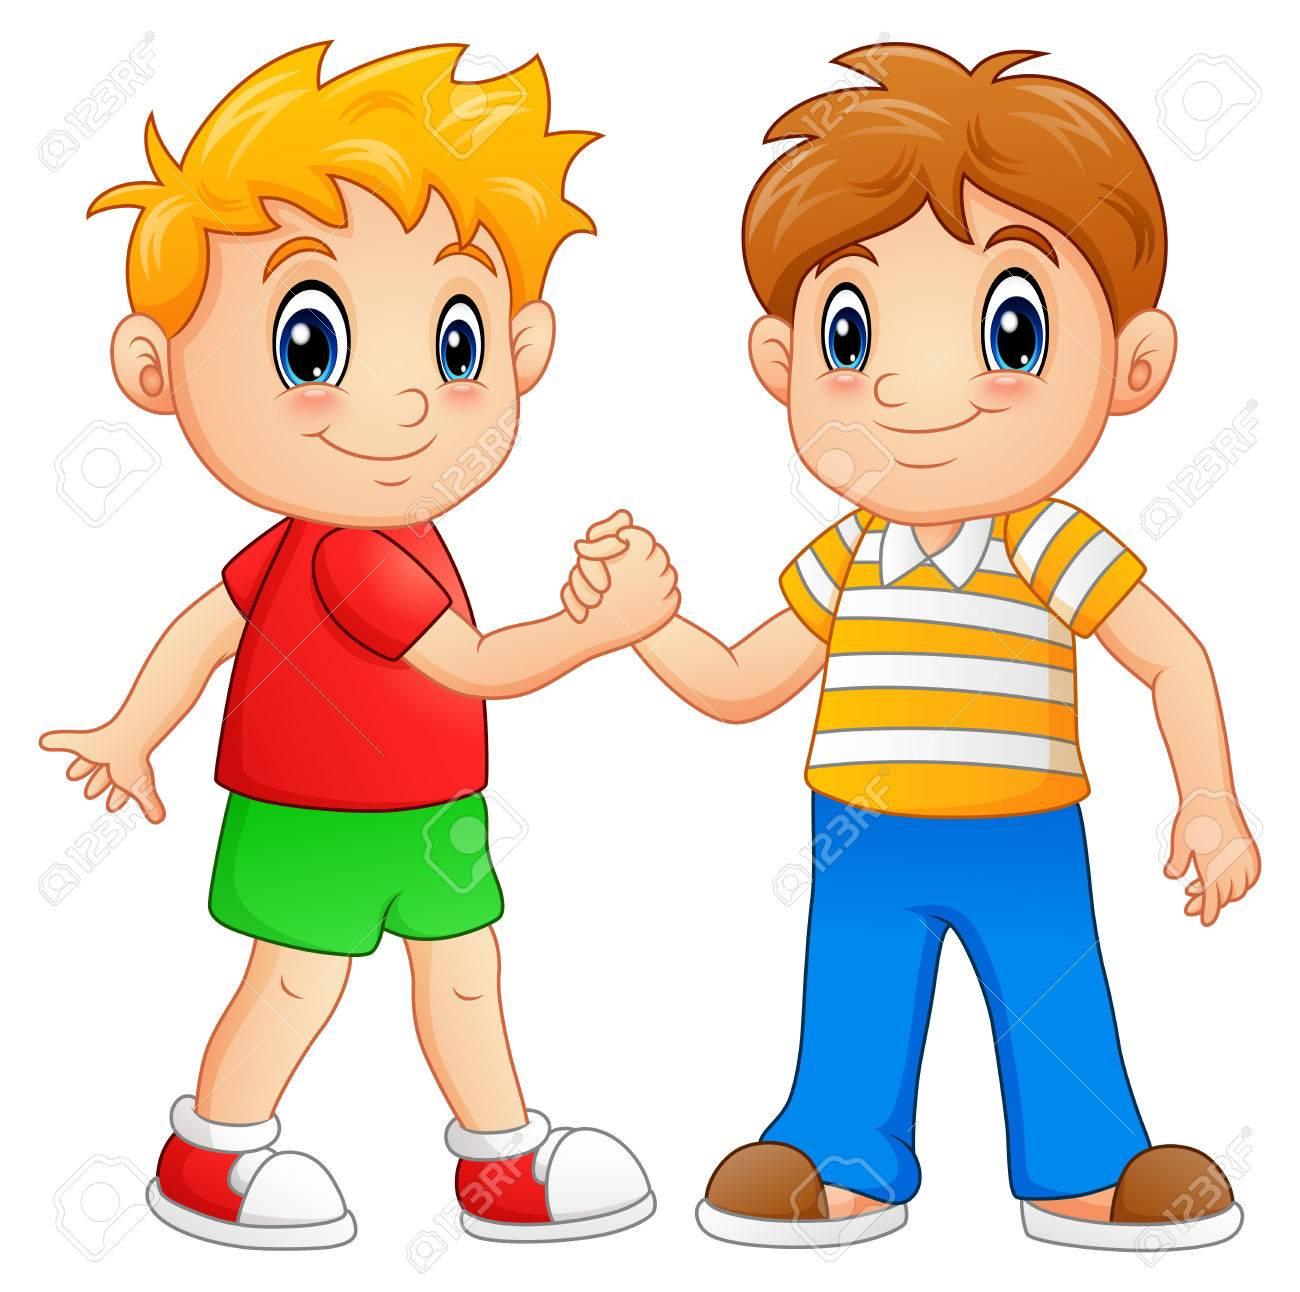 Handshake clipart boys. Children shaking hands images